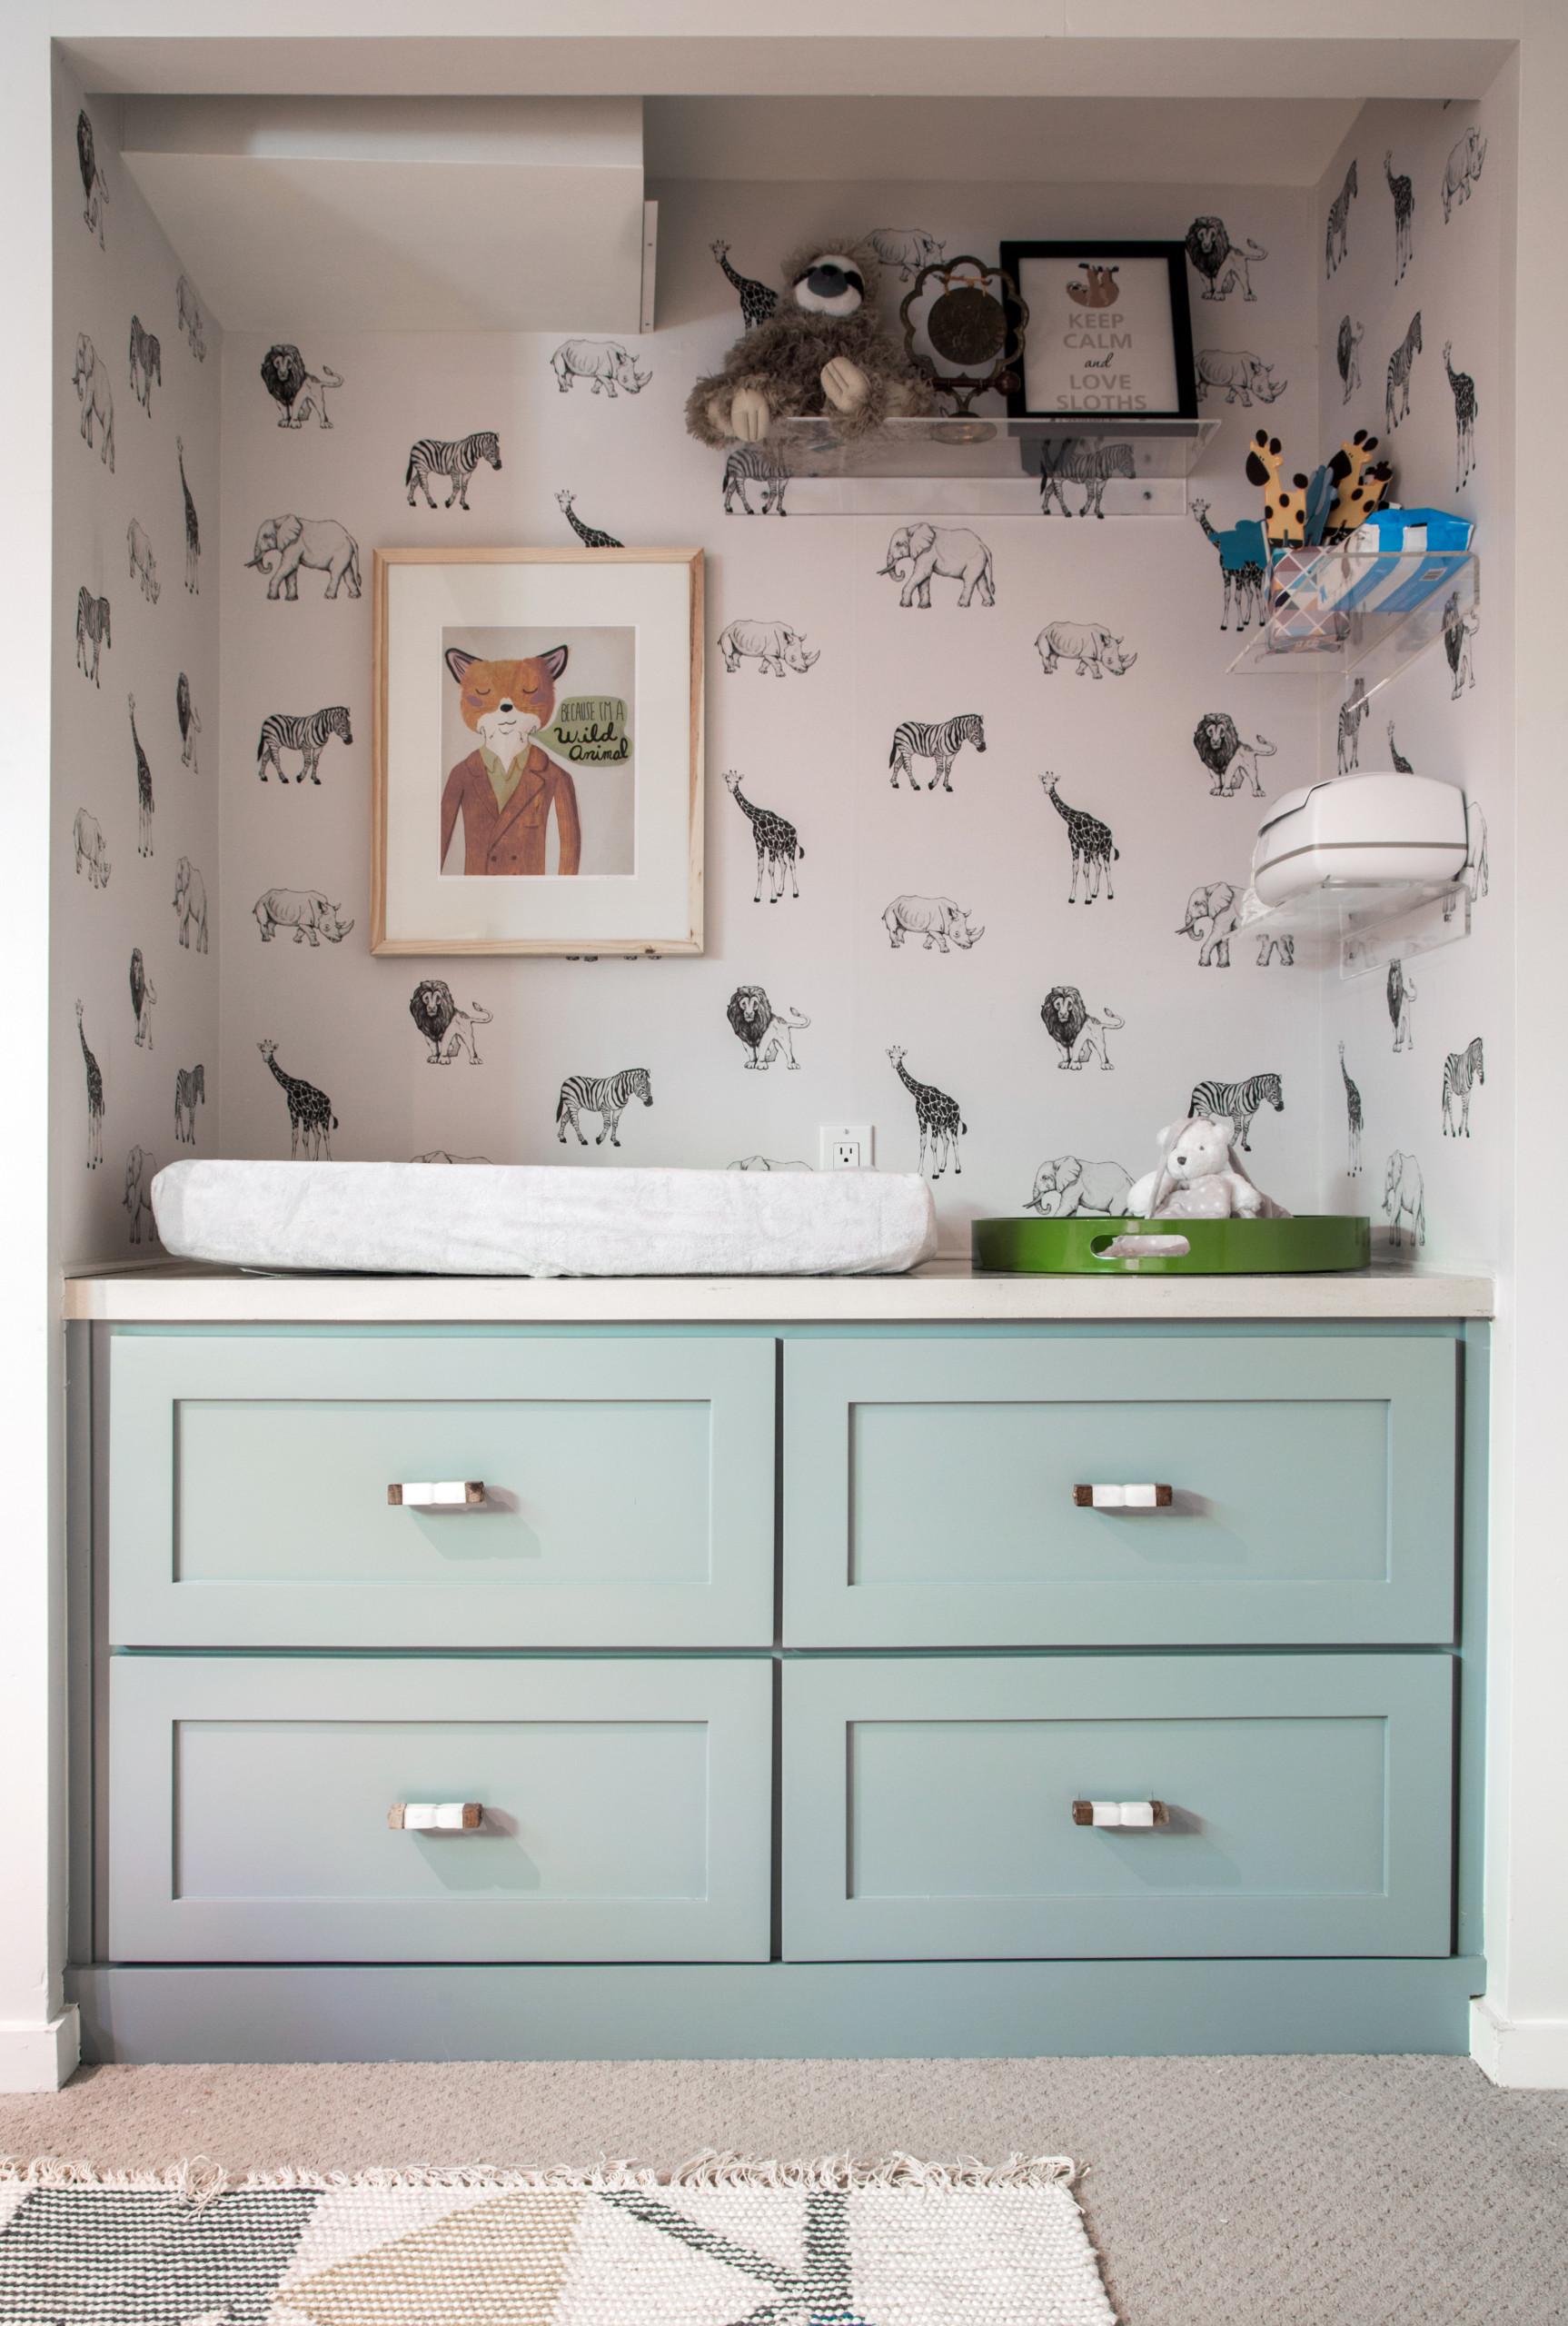 75 Beautiful Nursery Pictures Ideas Style Mid Century Modern February 2021 Houzz